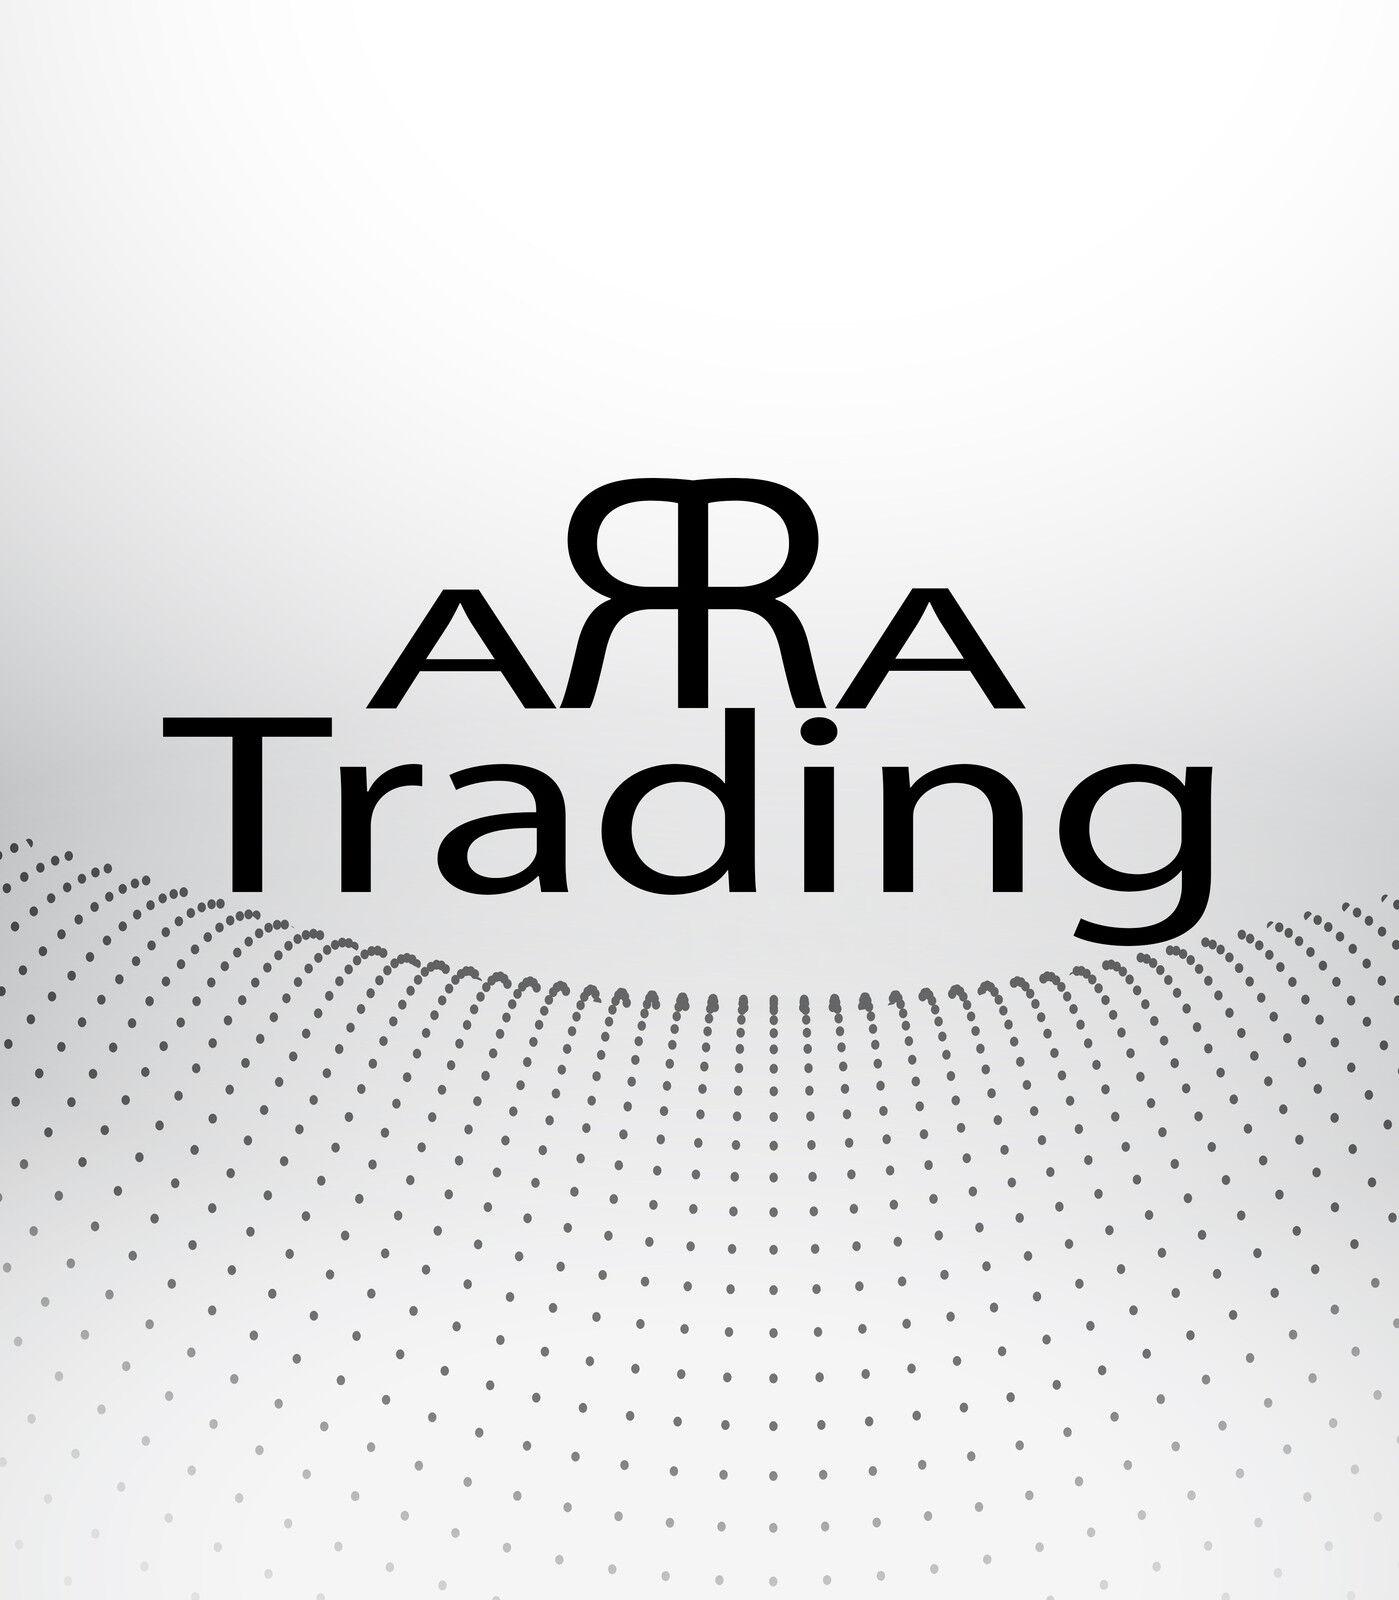 ARRA-Trading